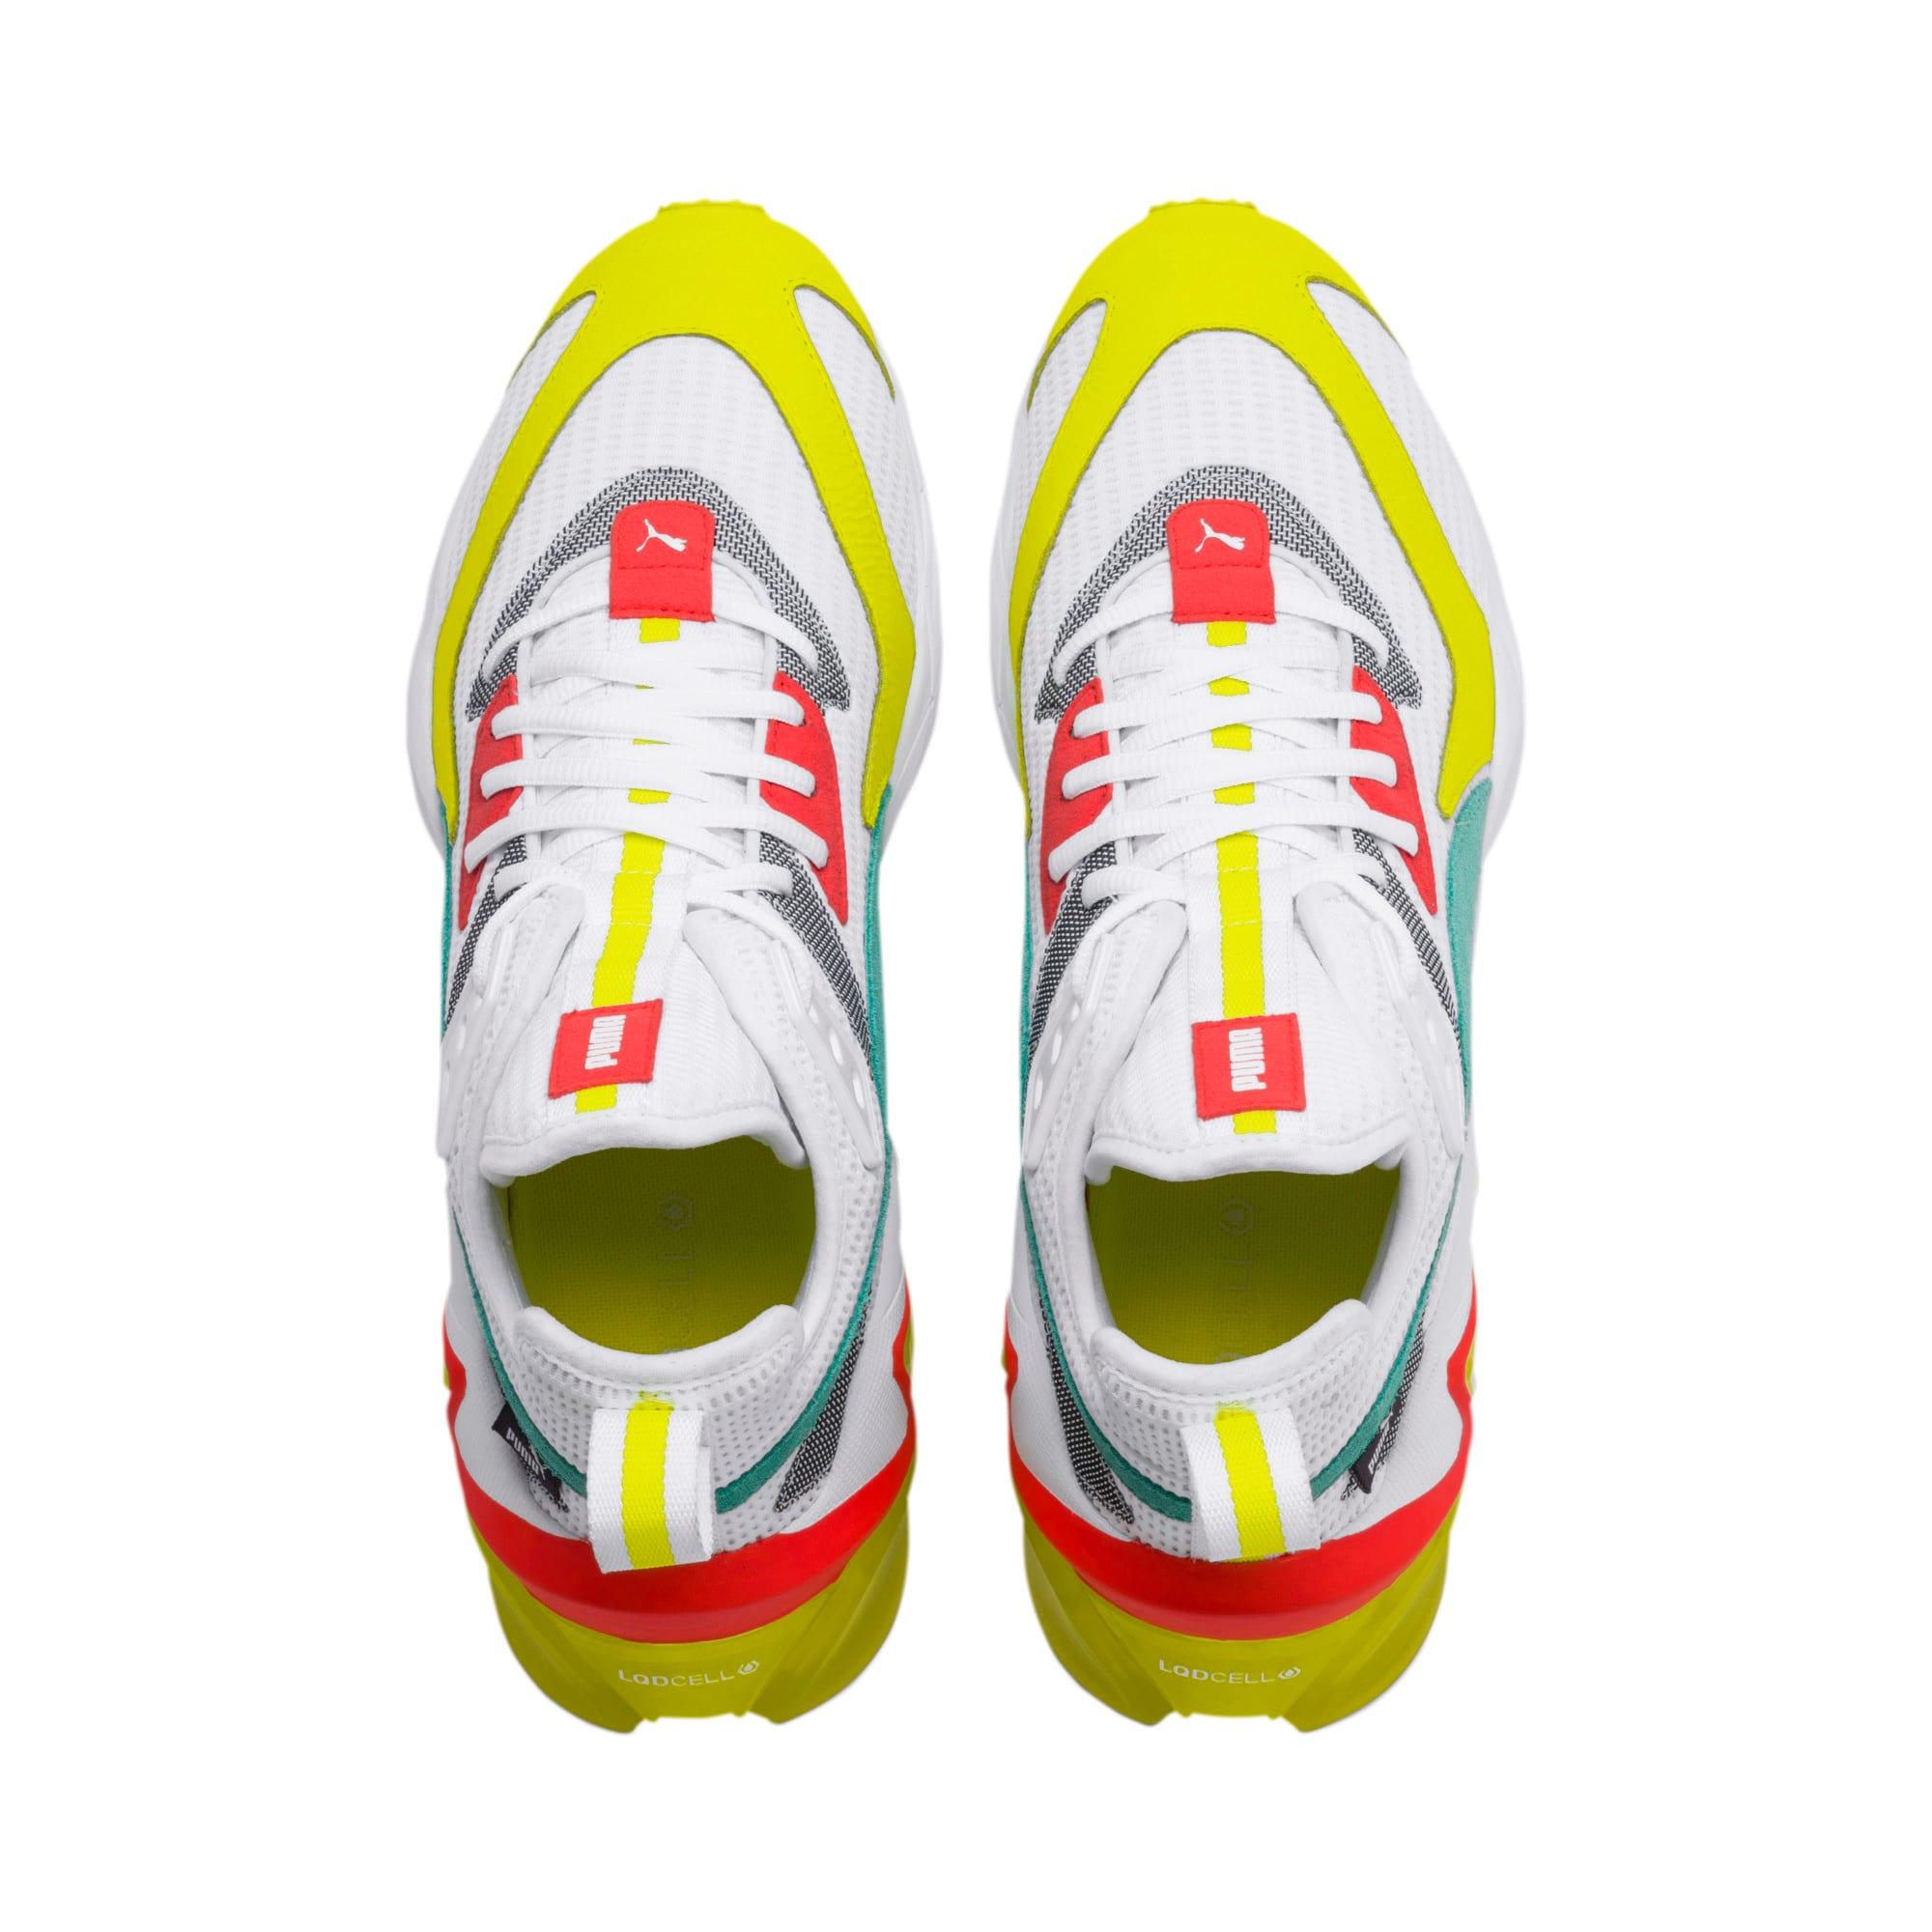 Miniatura 7 de Zapatos de entrenamientoLQDCELL Origin para hombre, Puma White-Yellow Alert, mediano